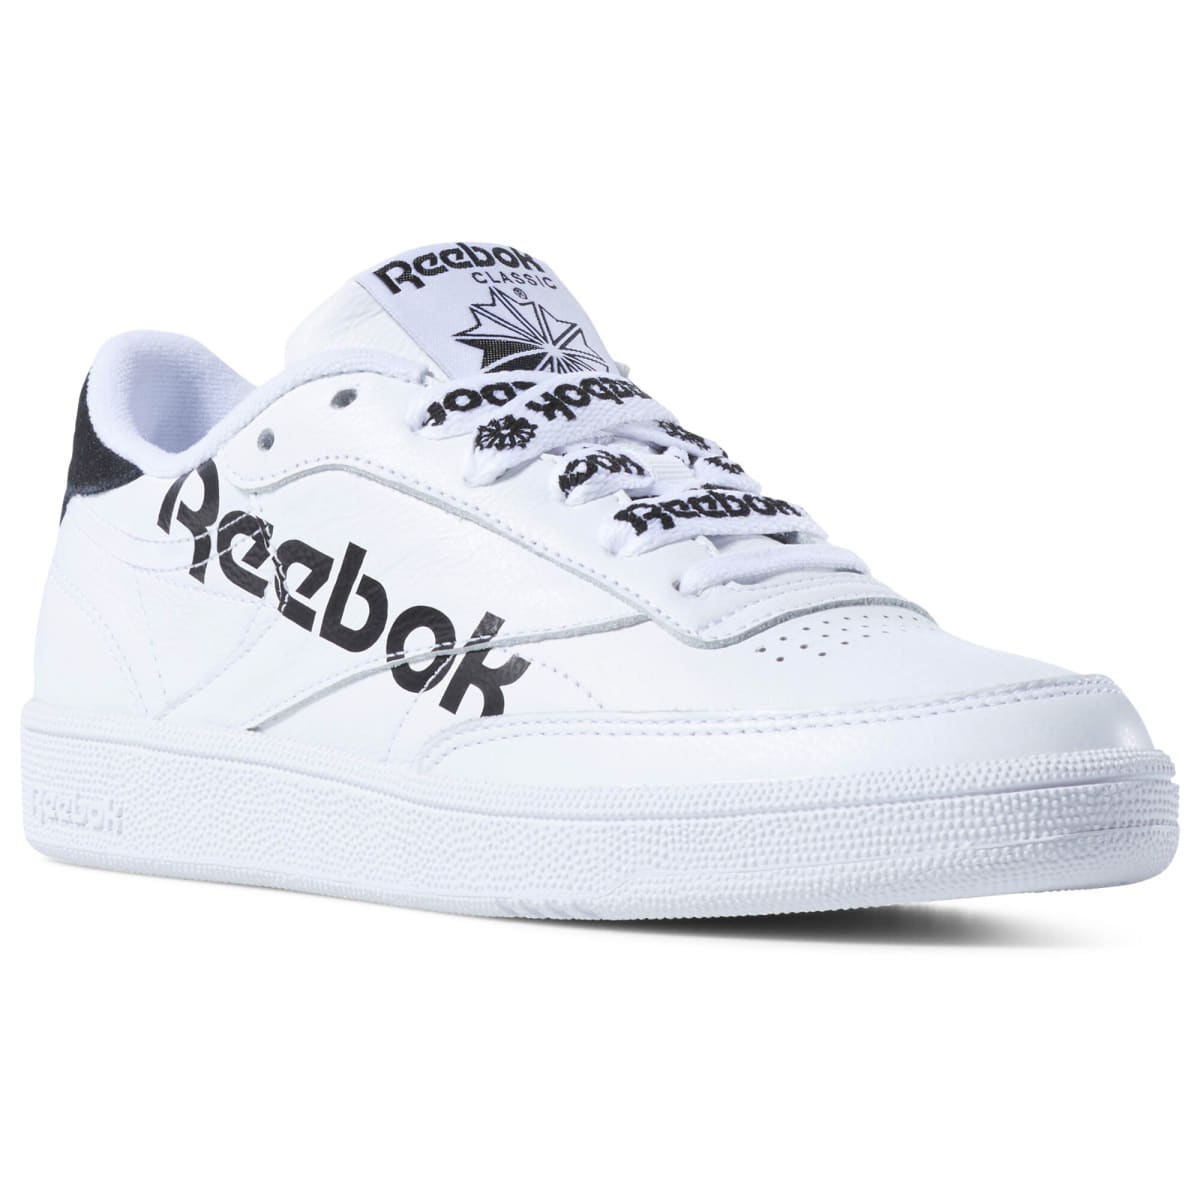 Reebok Club C 85 White | Reebok | Sole